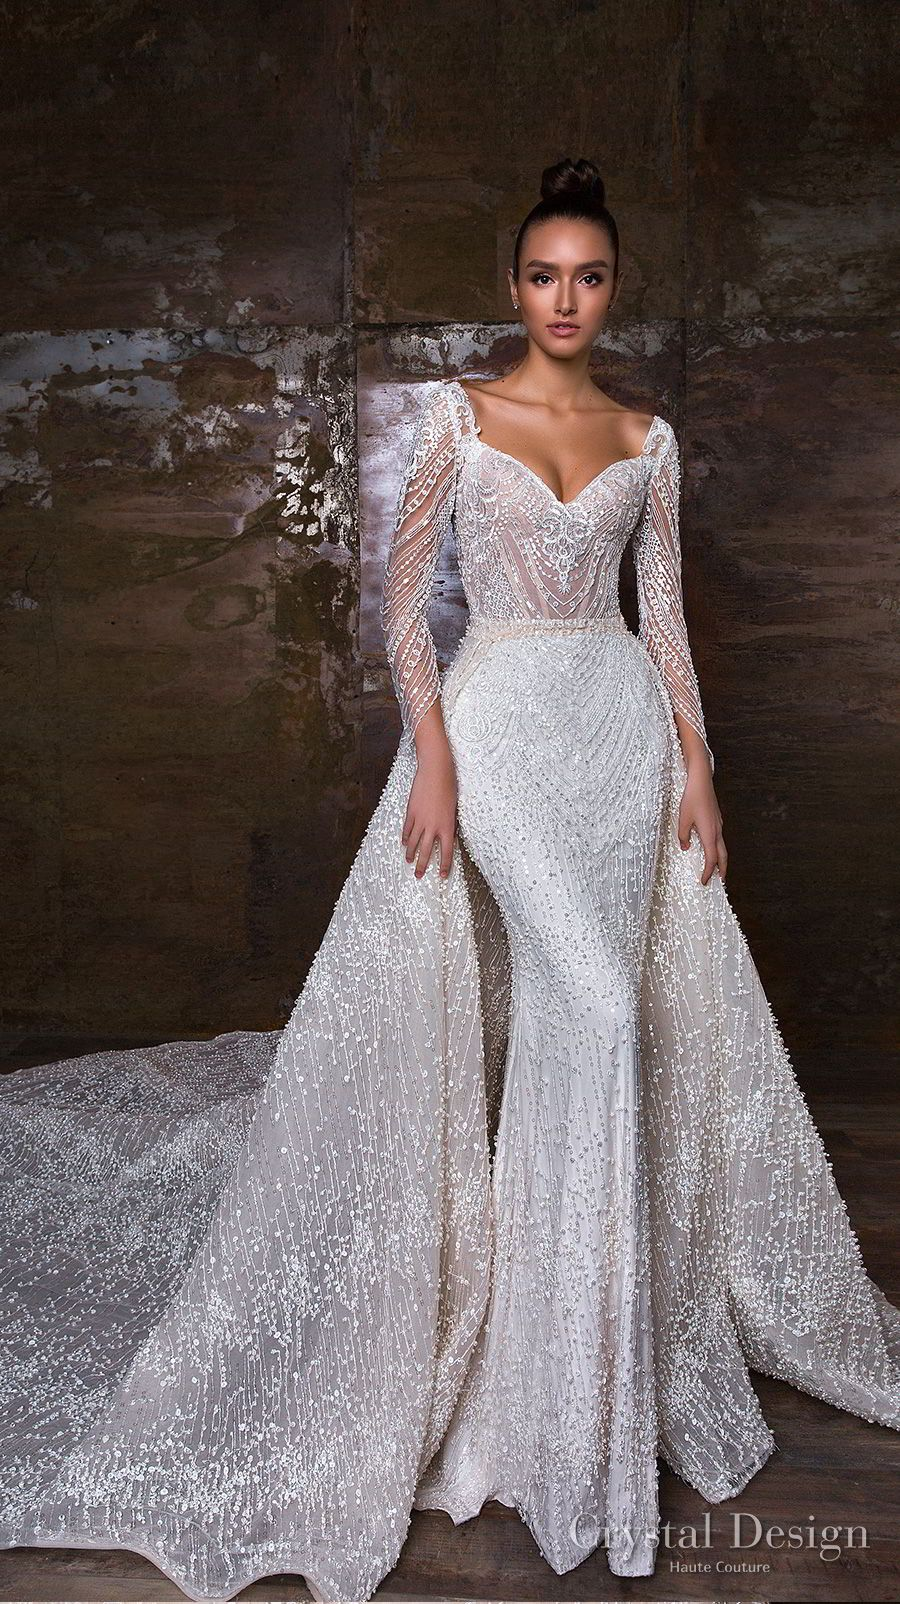 Crystal Design Abendkleider